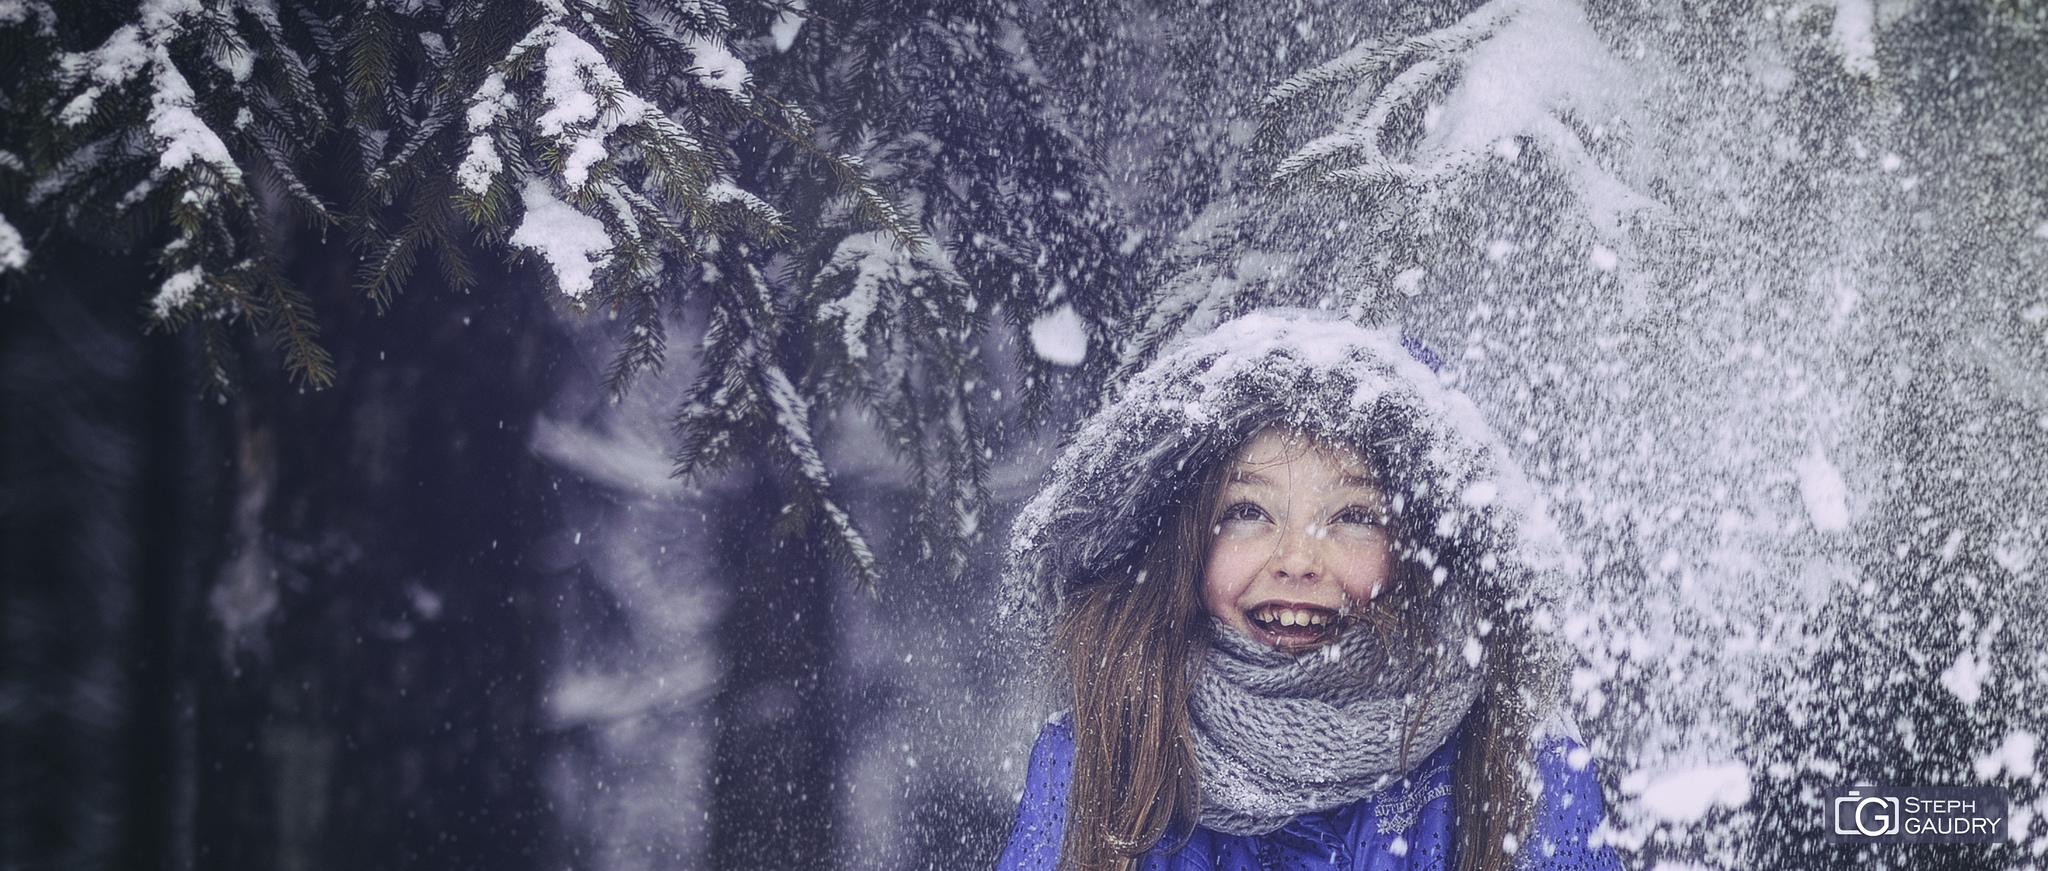 Les joies de la neige [Klik om de diavoorstelling te starten]